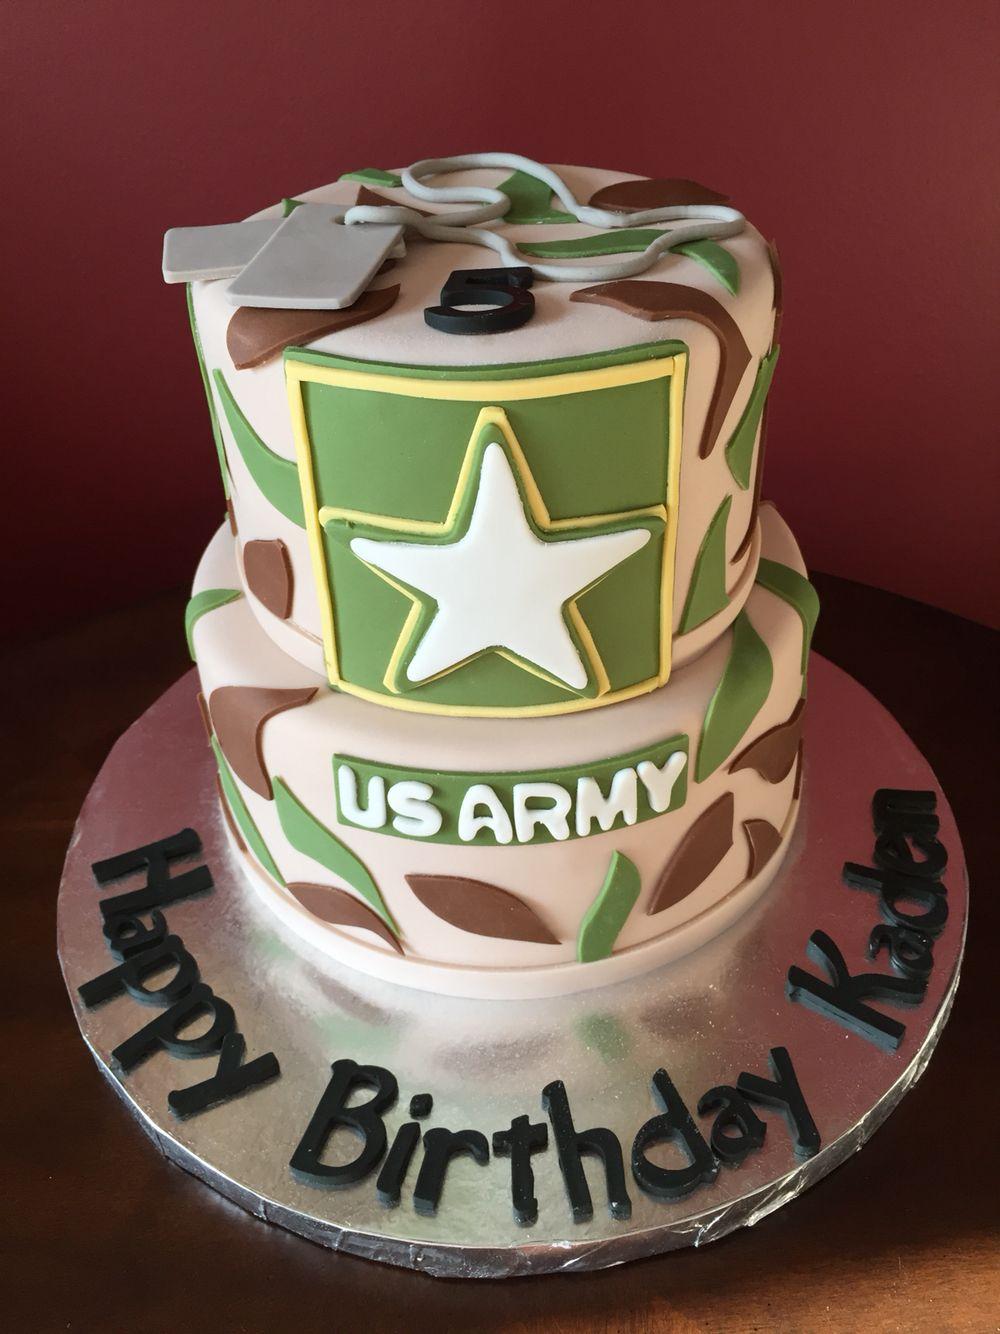 US Army Birthday Cake CAKES Pinterest Army birthday cakes